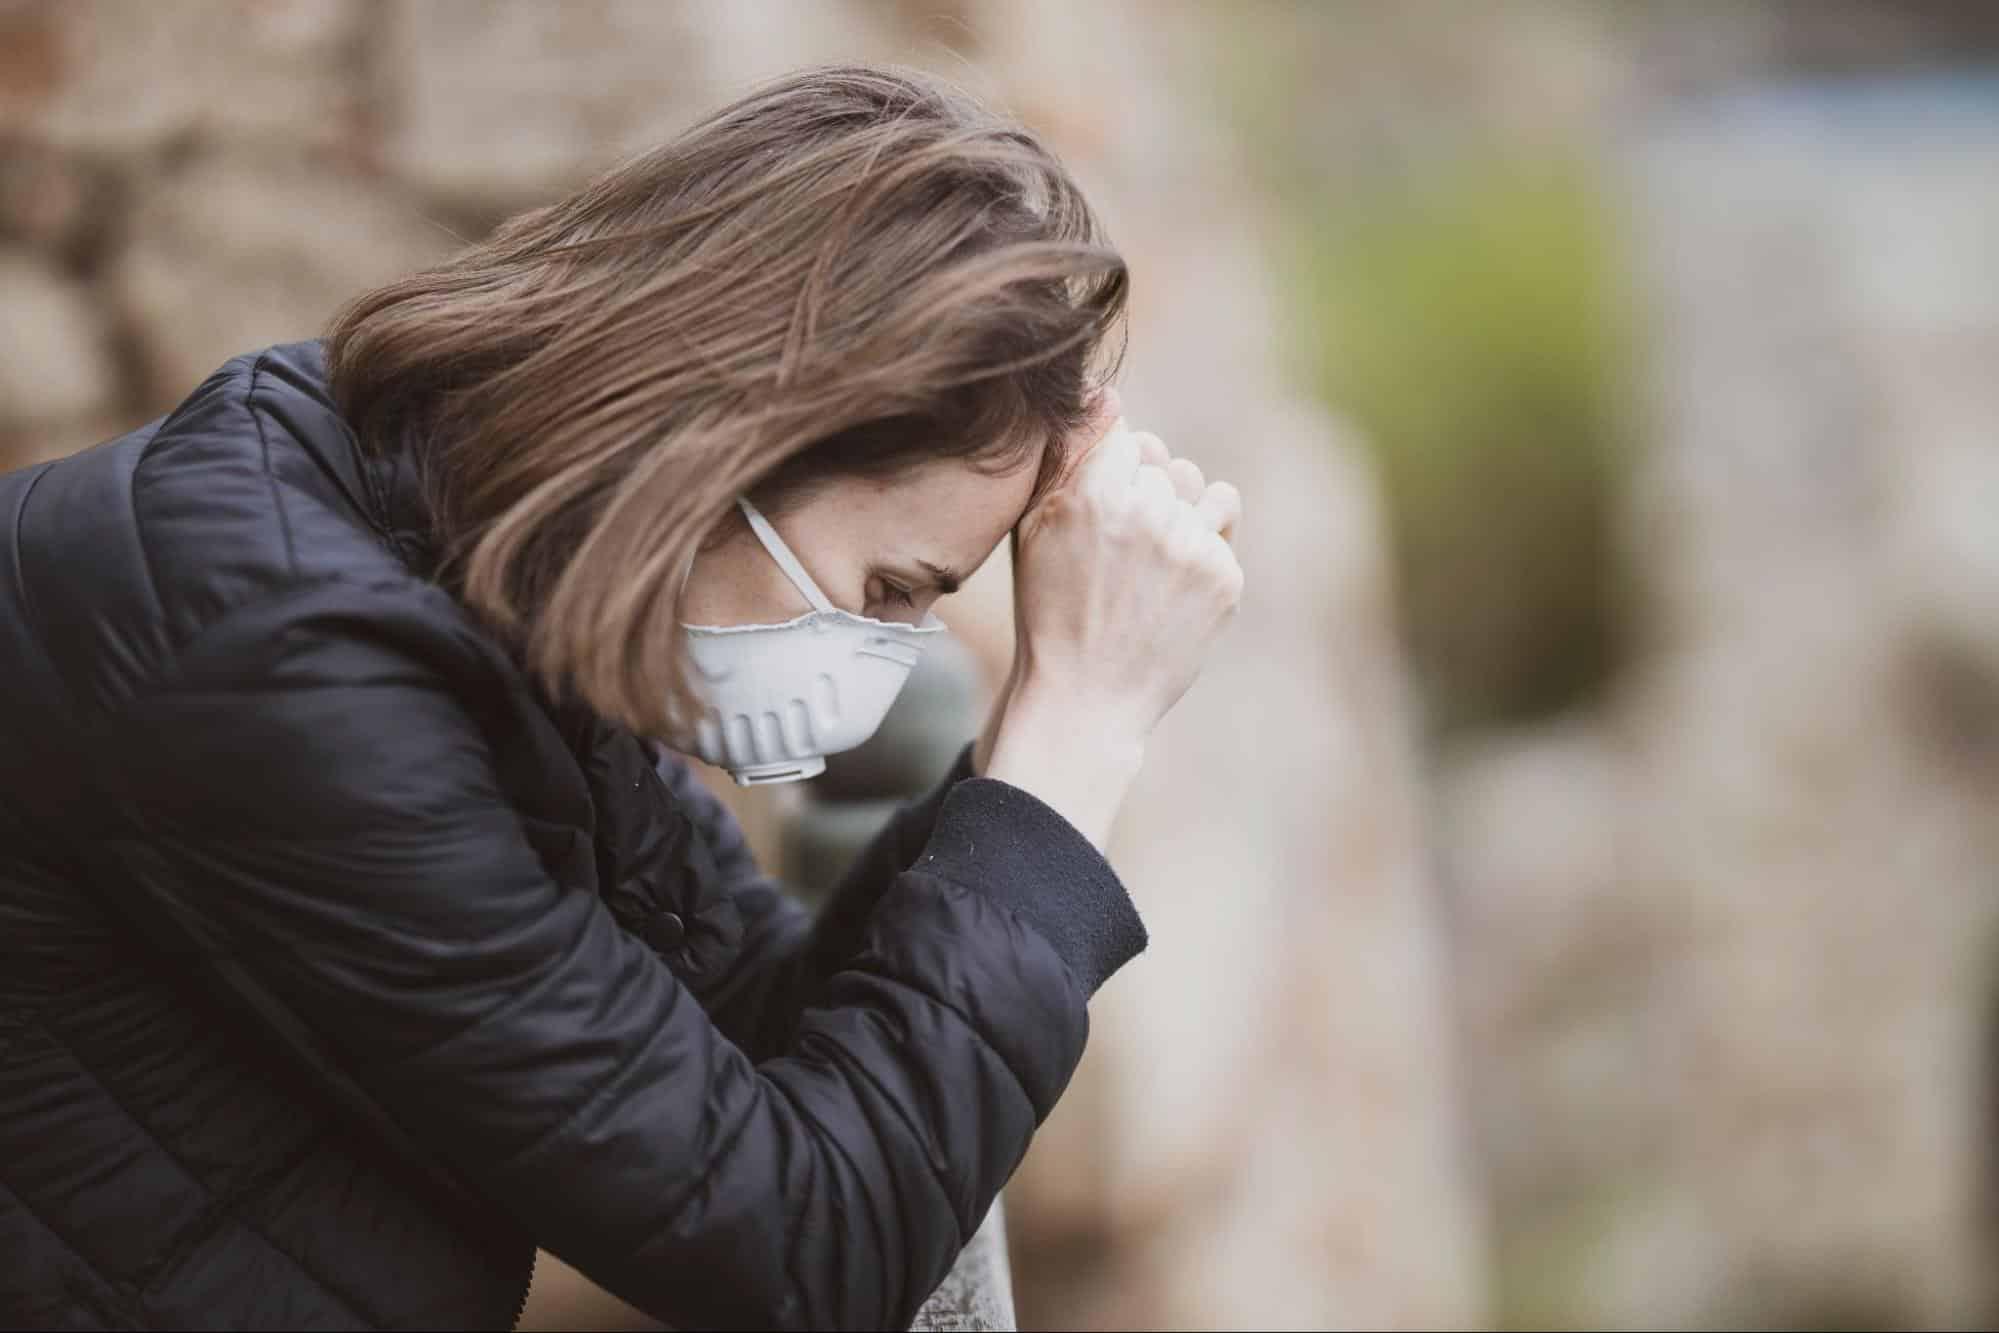 The Smog Causes Irritation and Headache